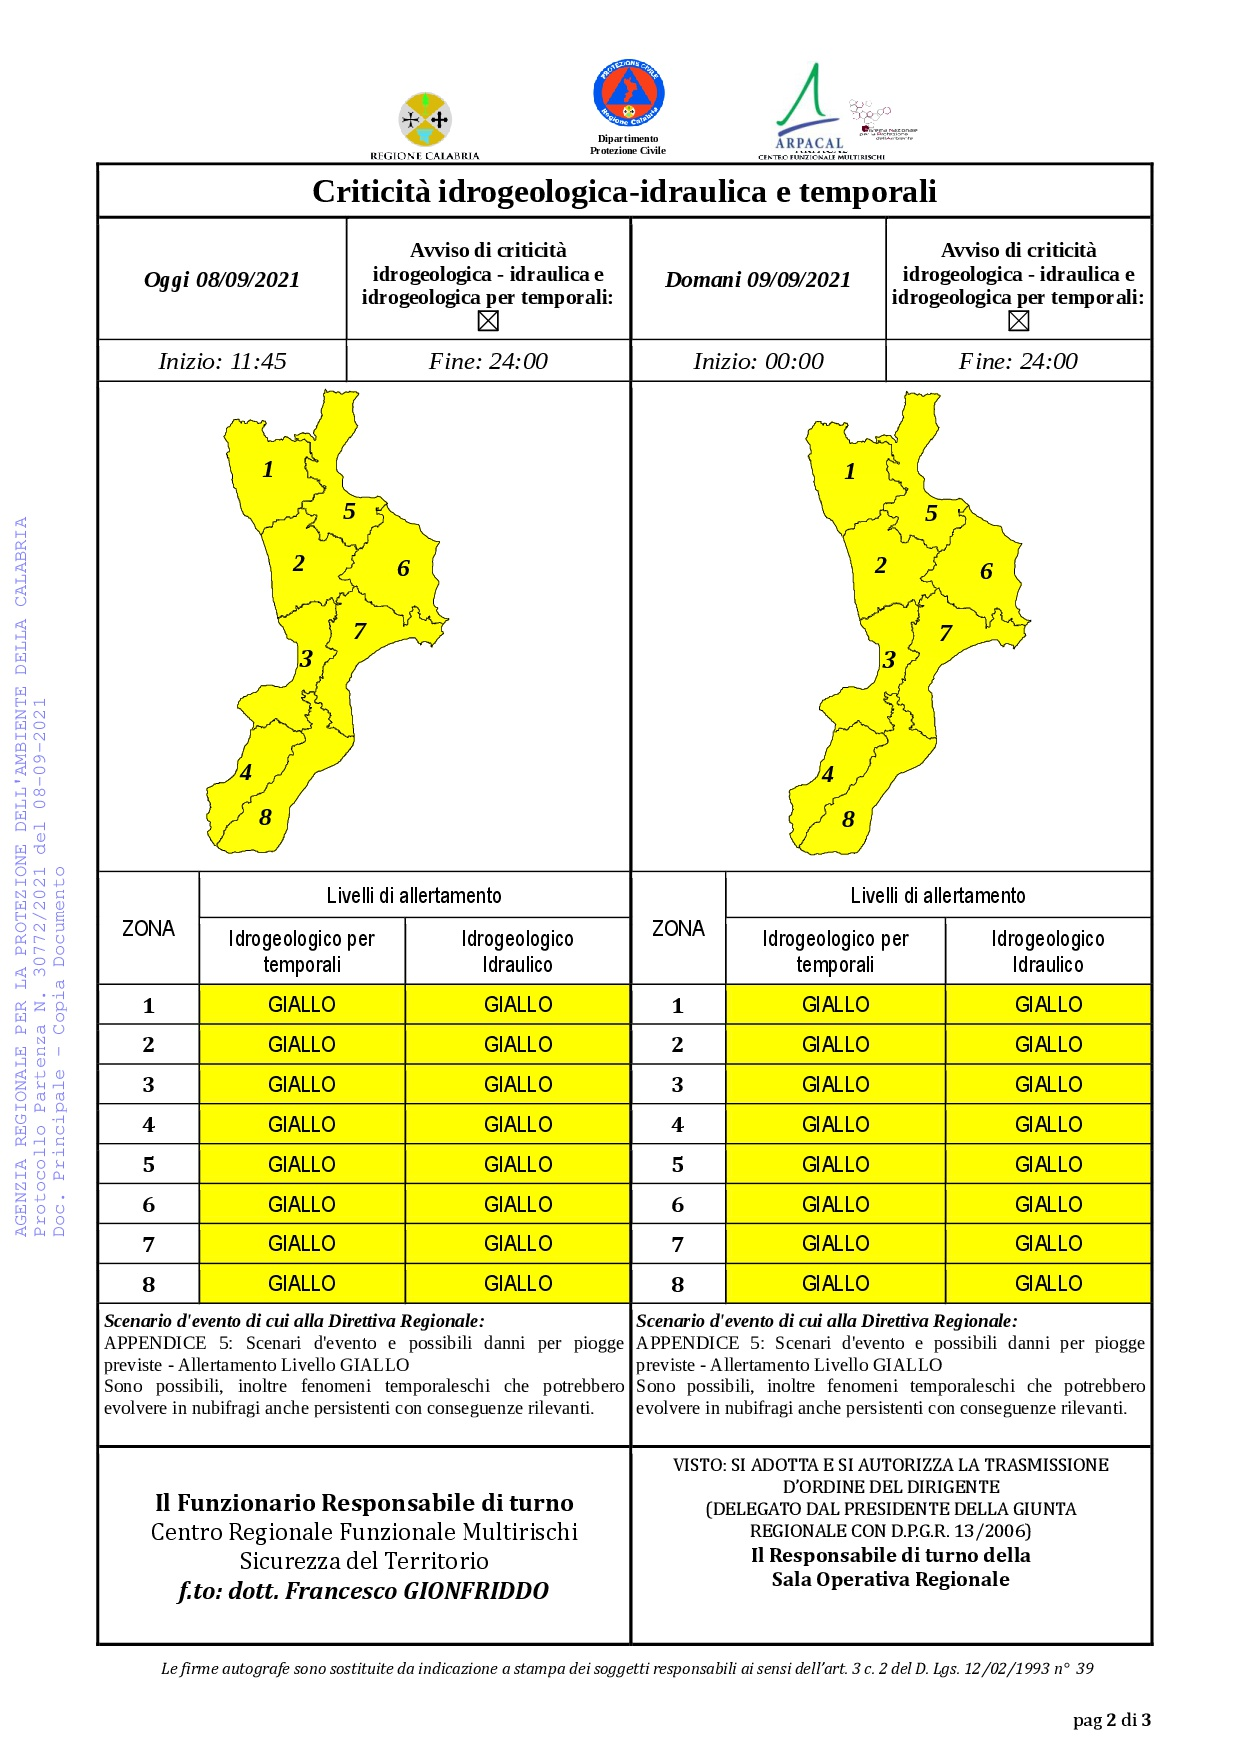 Criticità idrogeologica-idraulica e temporali in Calabria 08-09-2021